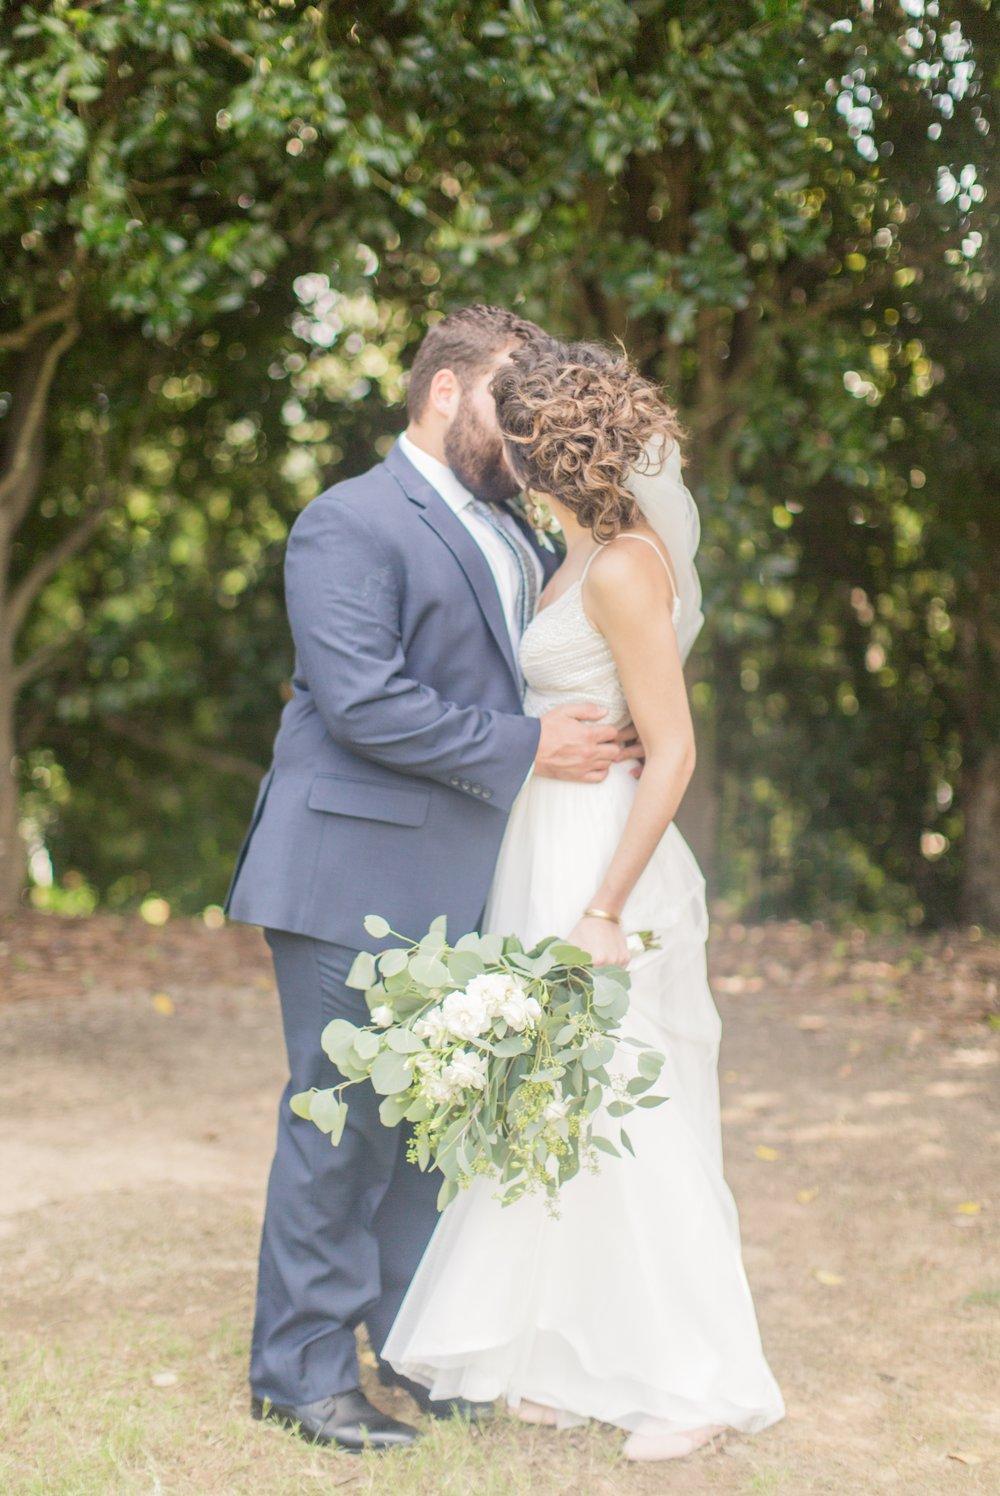 birmingham-summer-wedding 41.jpg